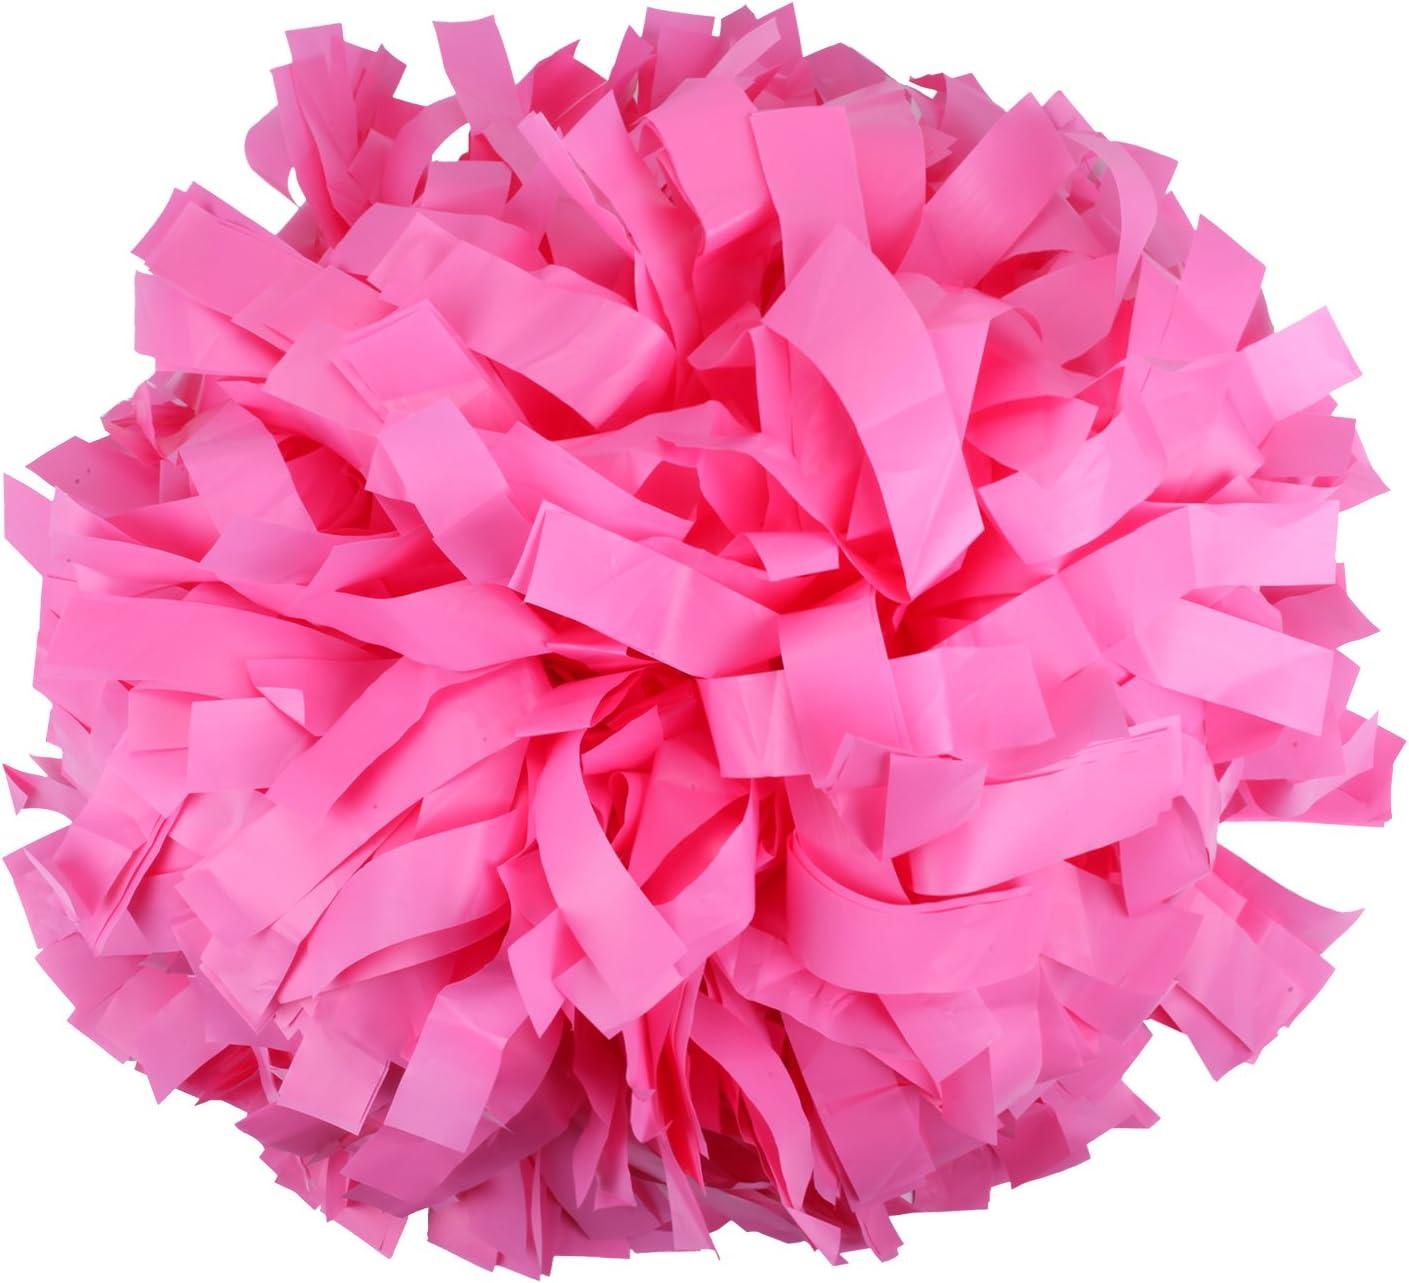 ICObuty Plastic Cheerleader Cheerleading Pom Poms 6 inch 1 Pair 2 Pieces